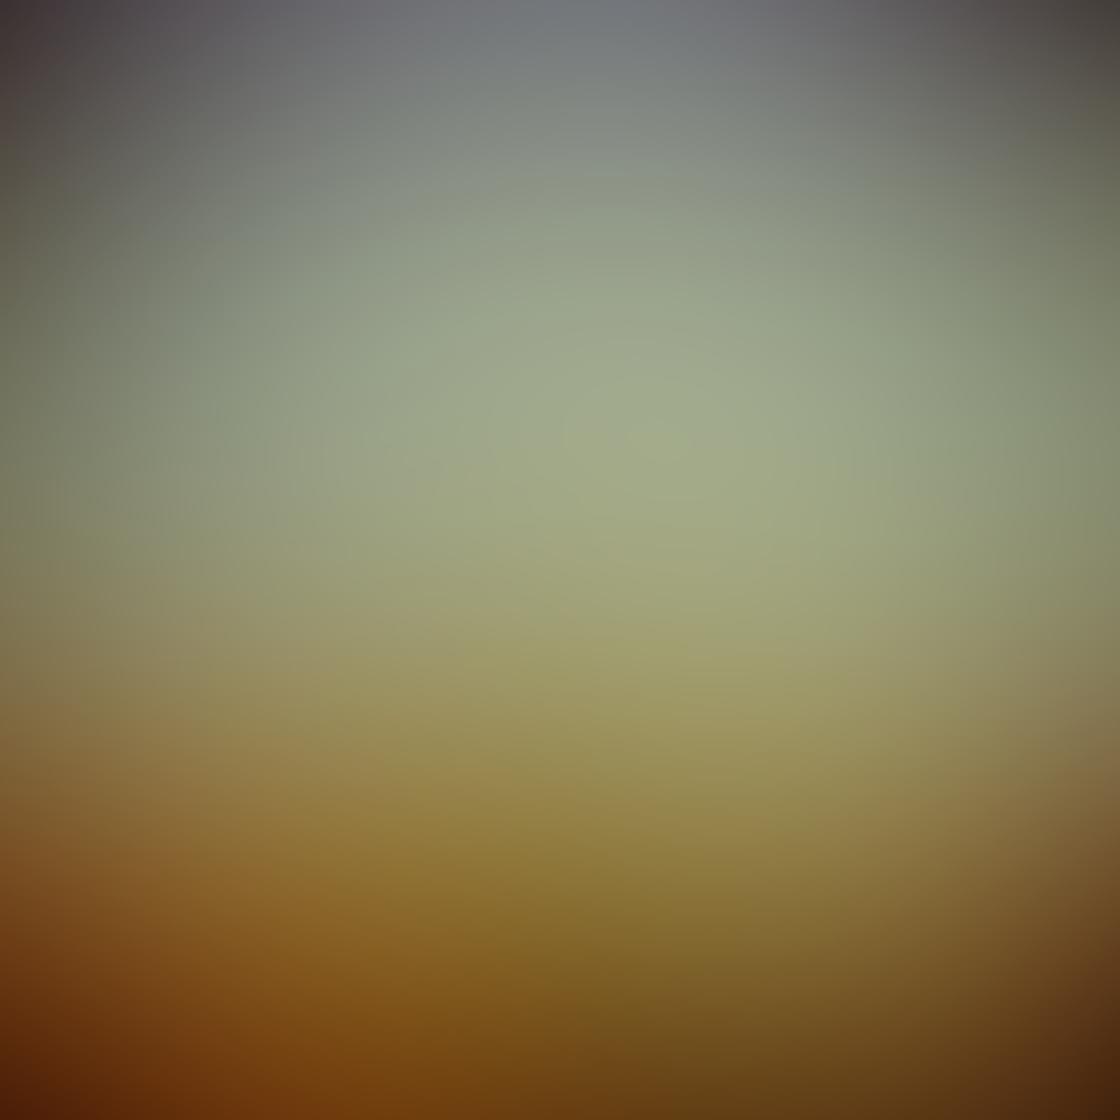 iPhone Photos Negative Space 25